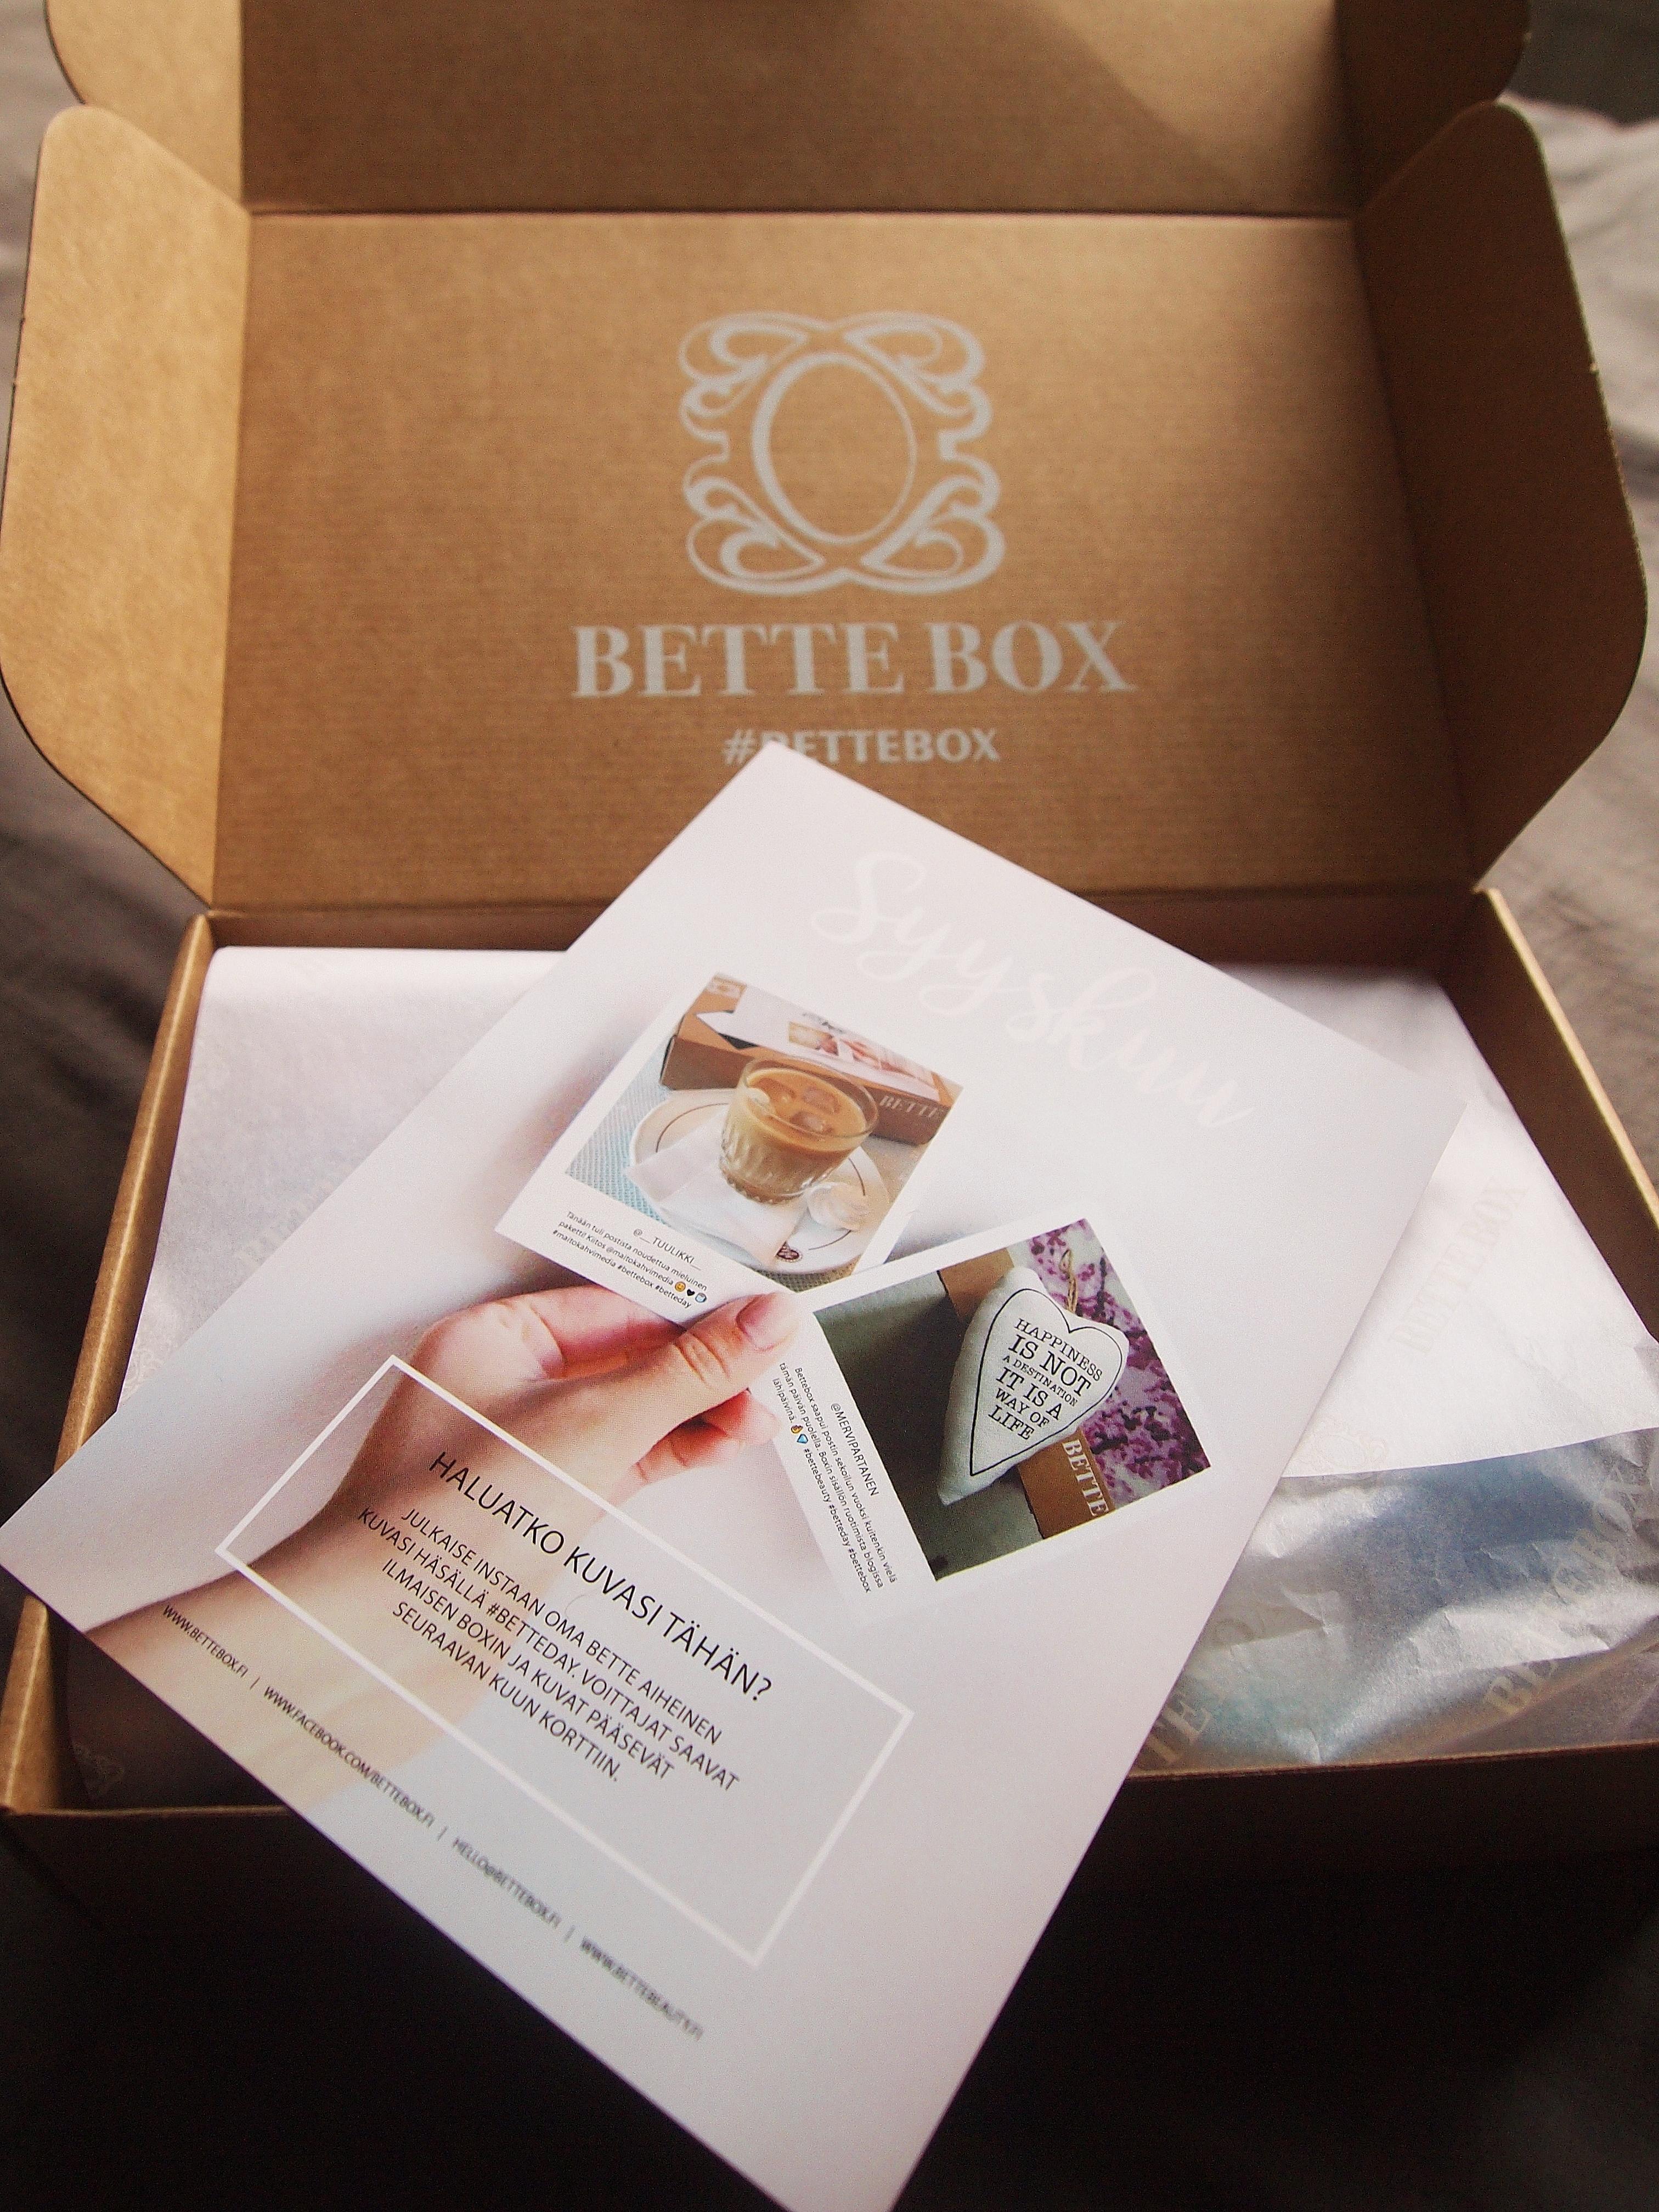 Bette Box syyskuu 2017